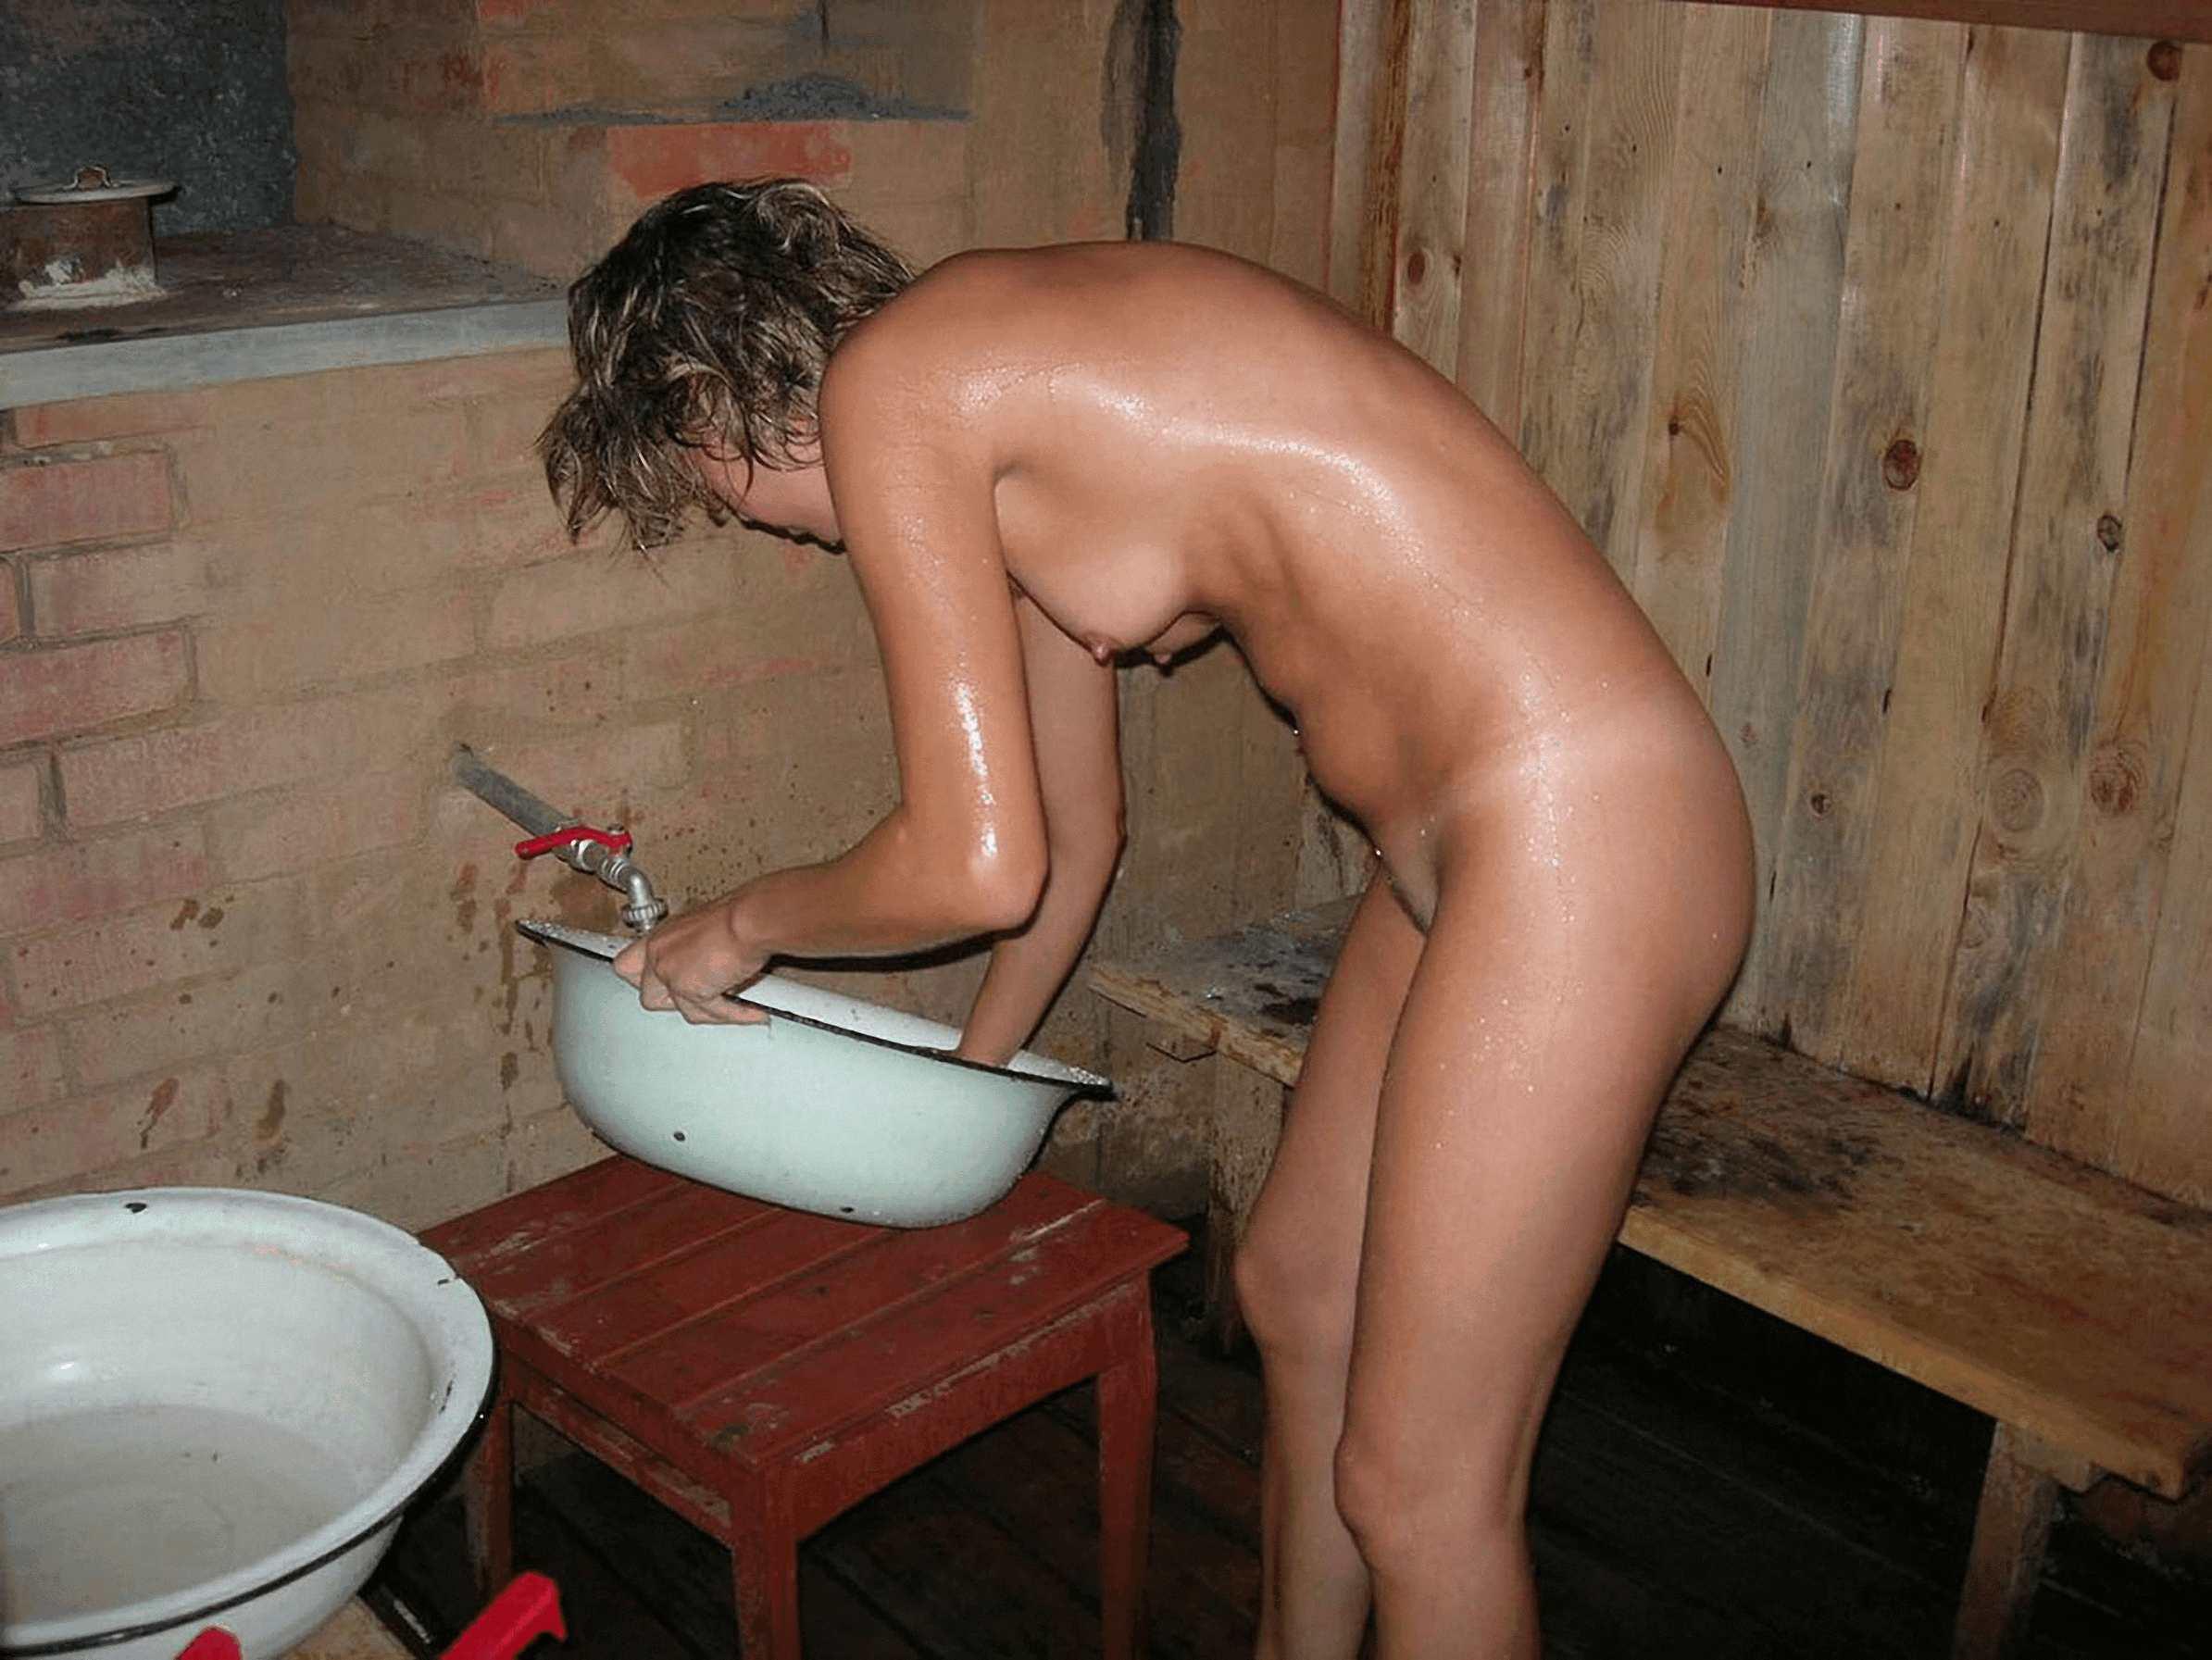 Фото девушки моются в бани 3 фотография